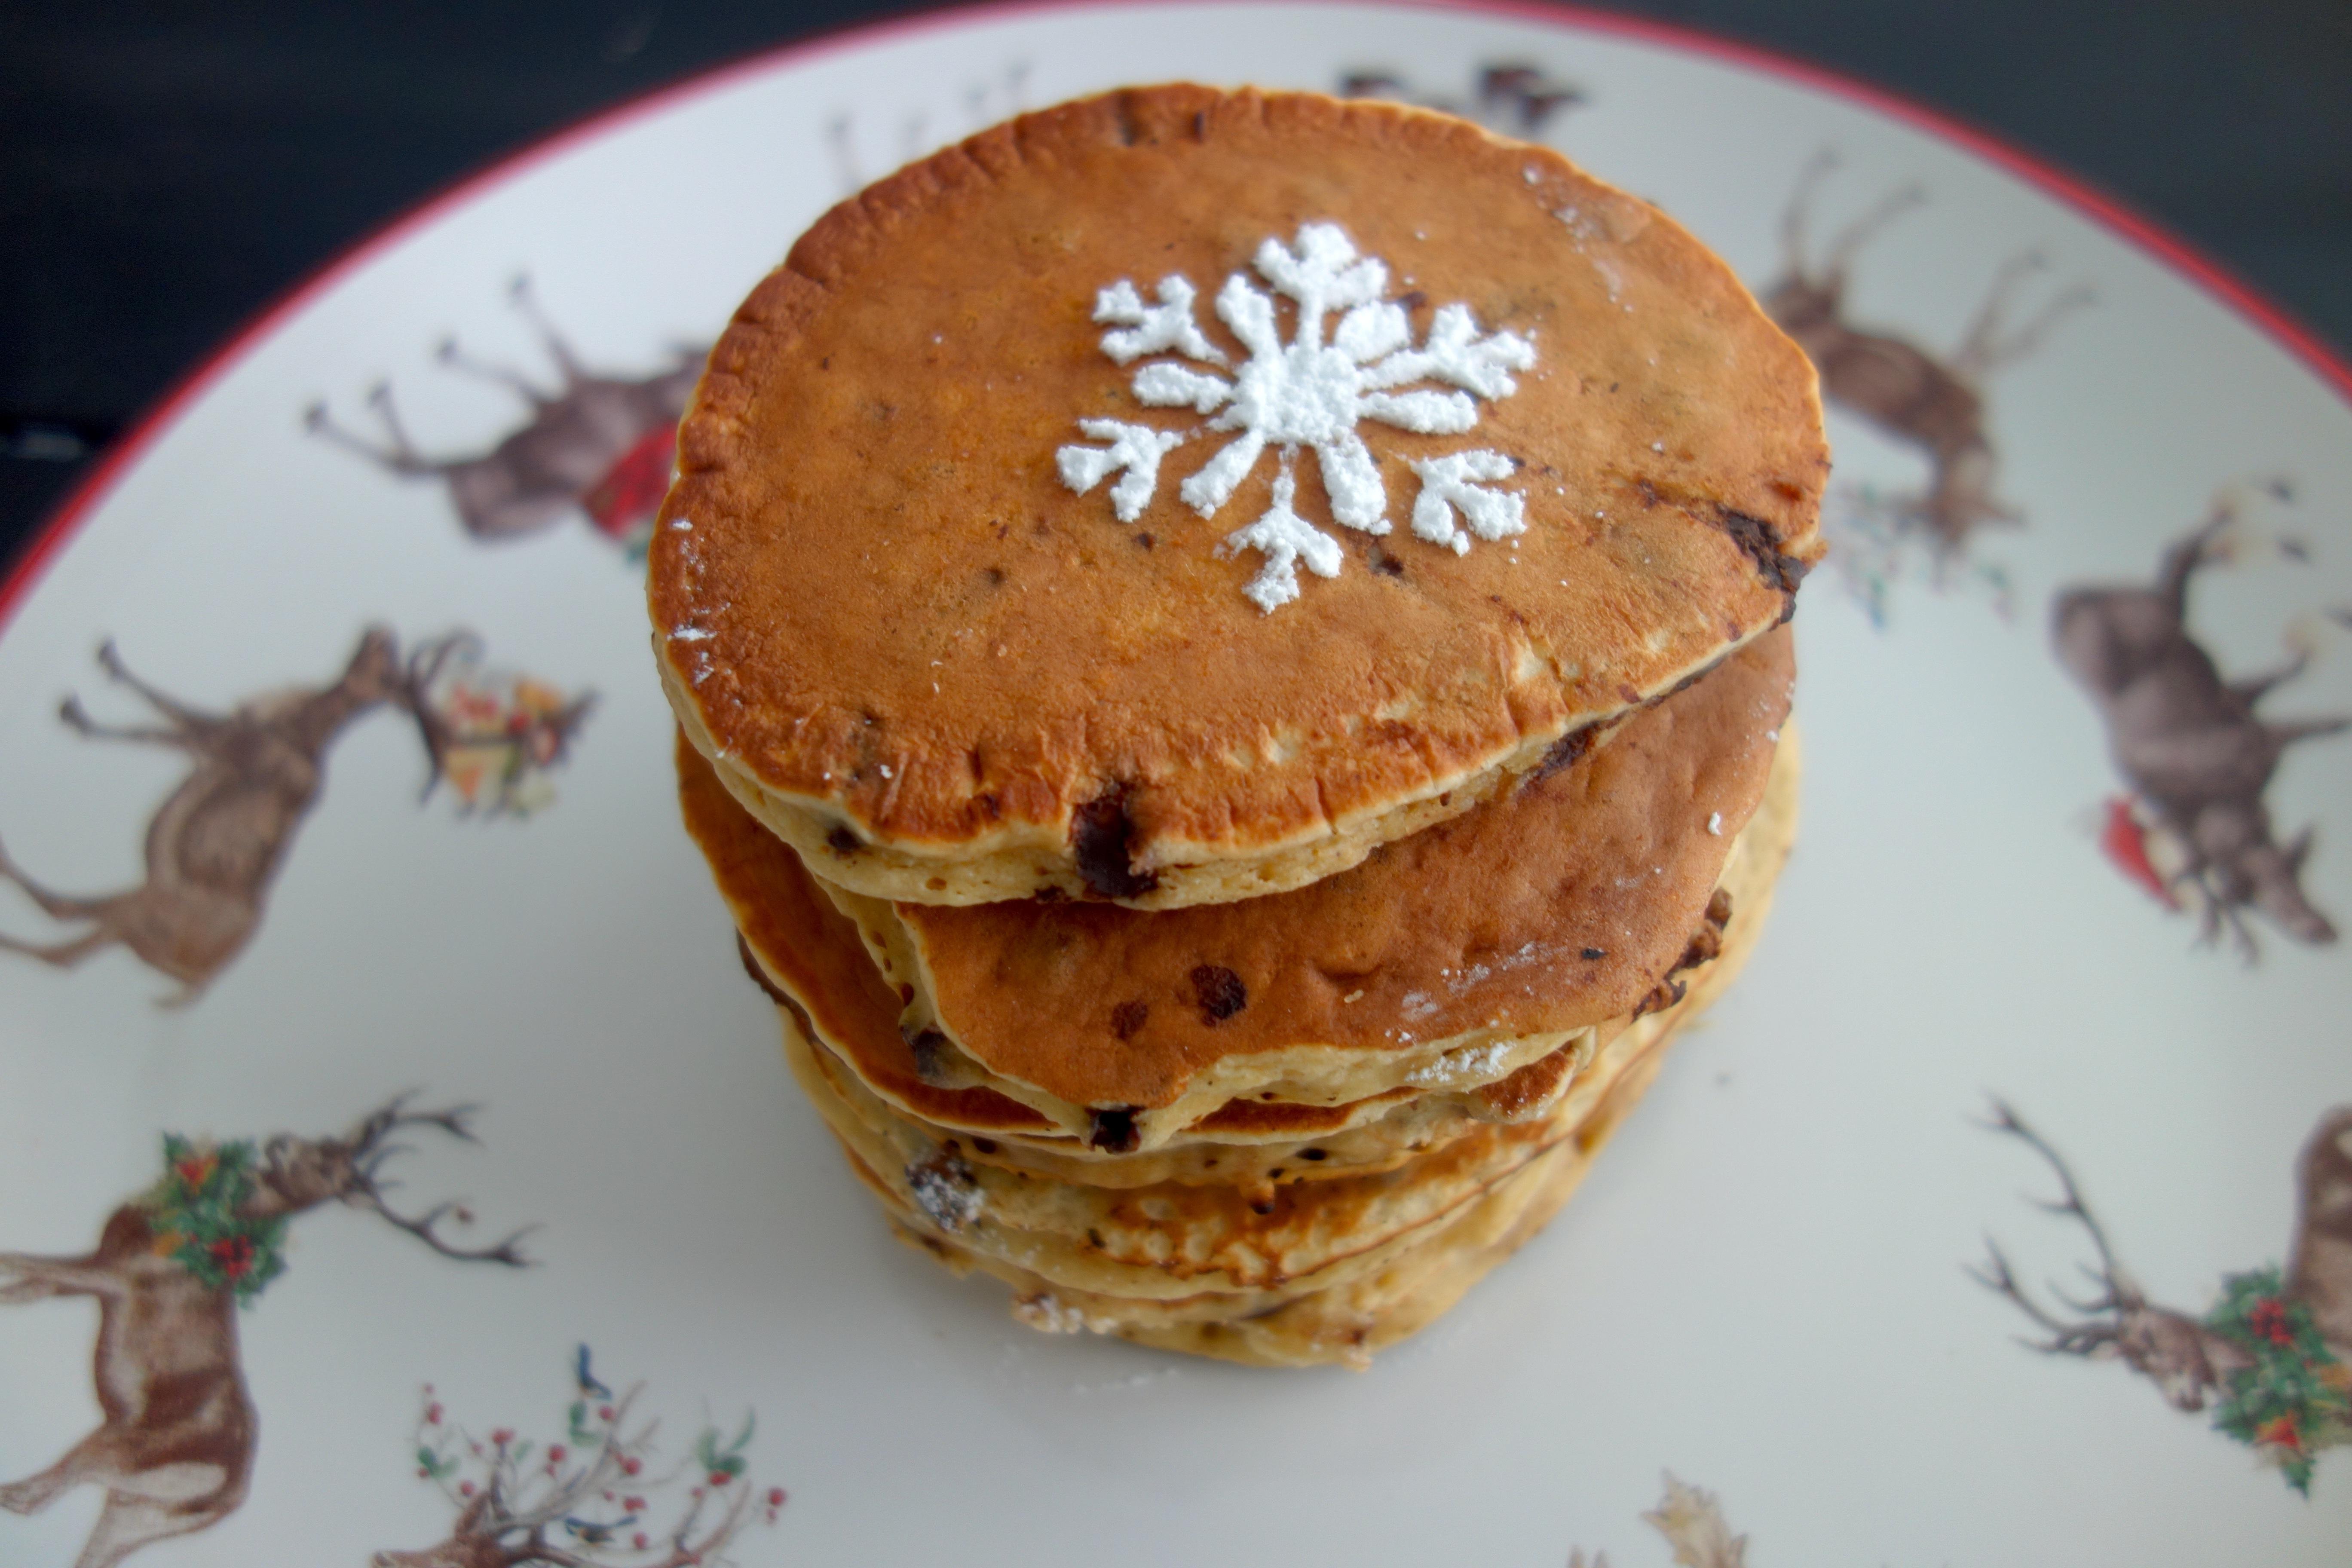 Chocolate Chip Egg Nog Pancakes